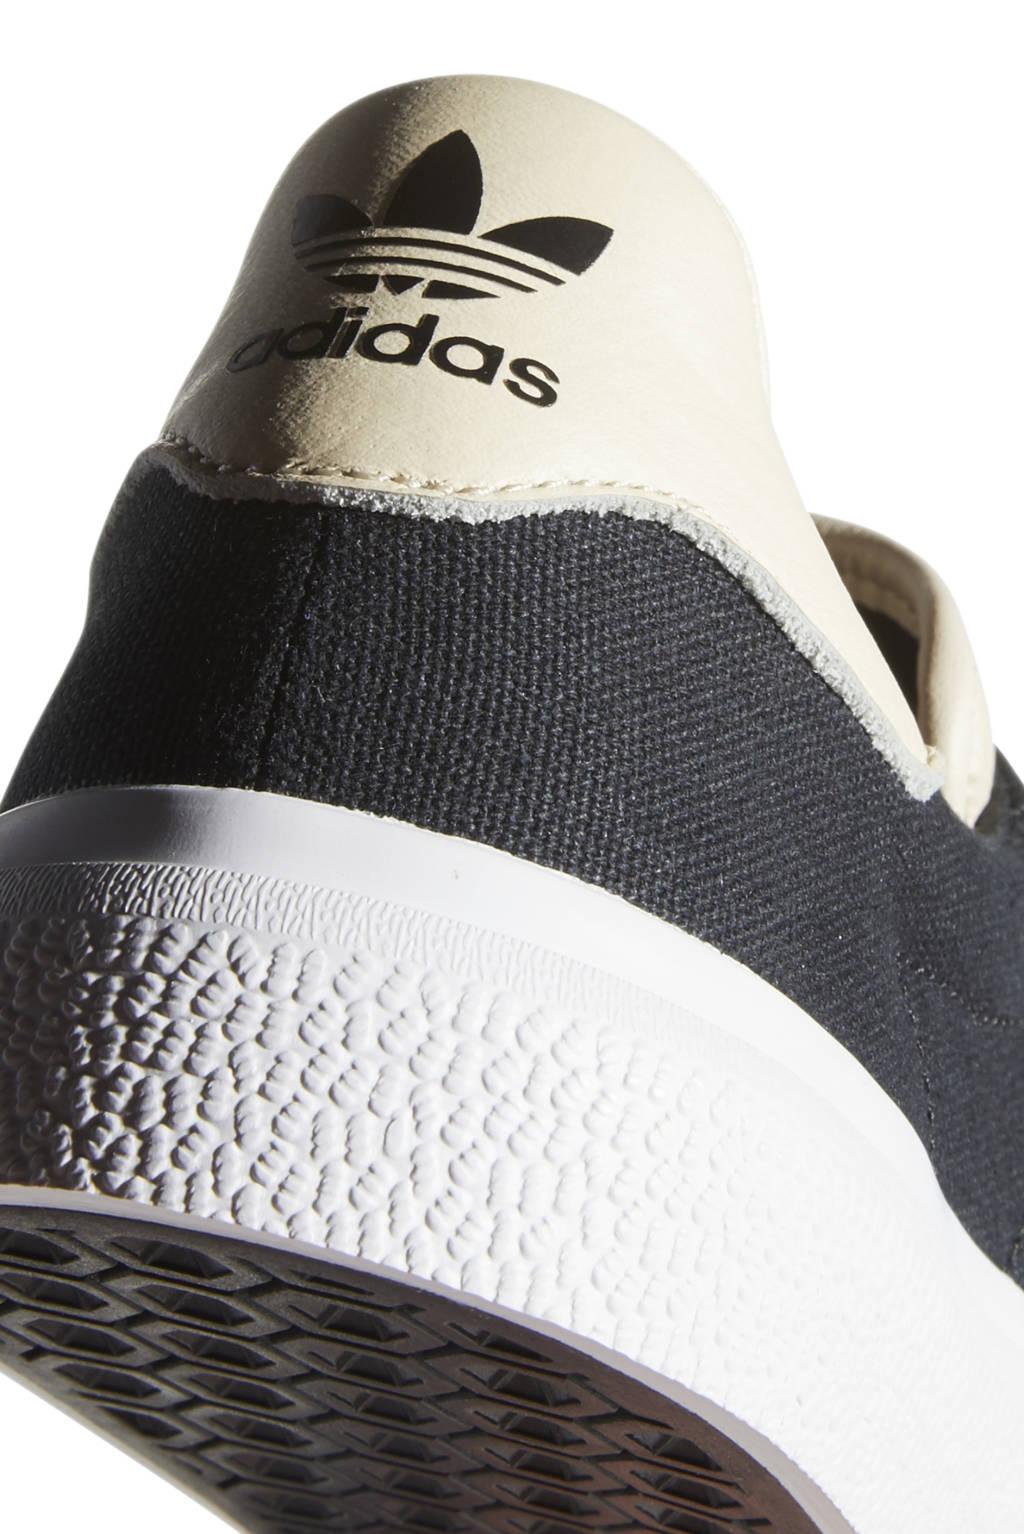 adidas Originals   sneakers zwart/ecru, Zwart/ecru